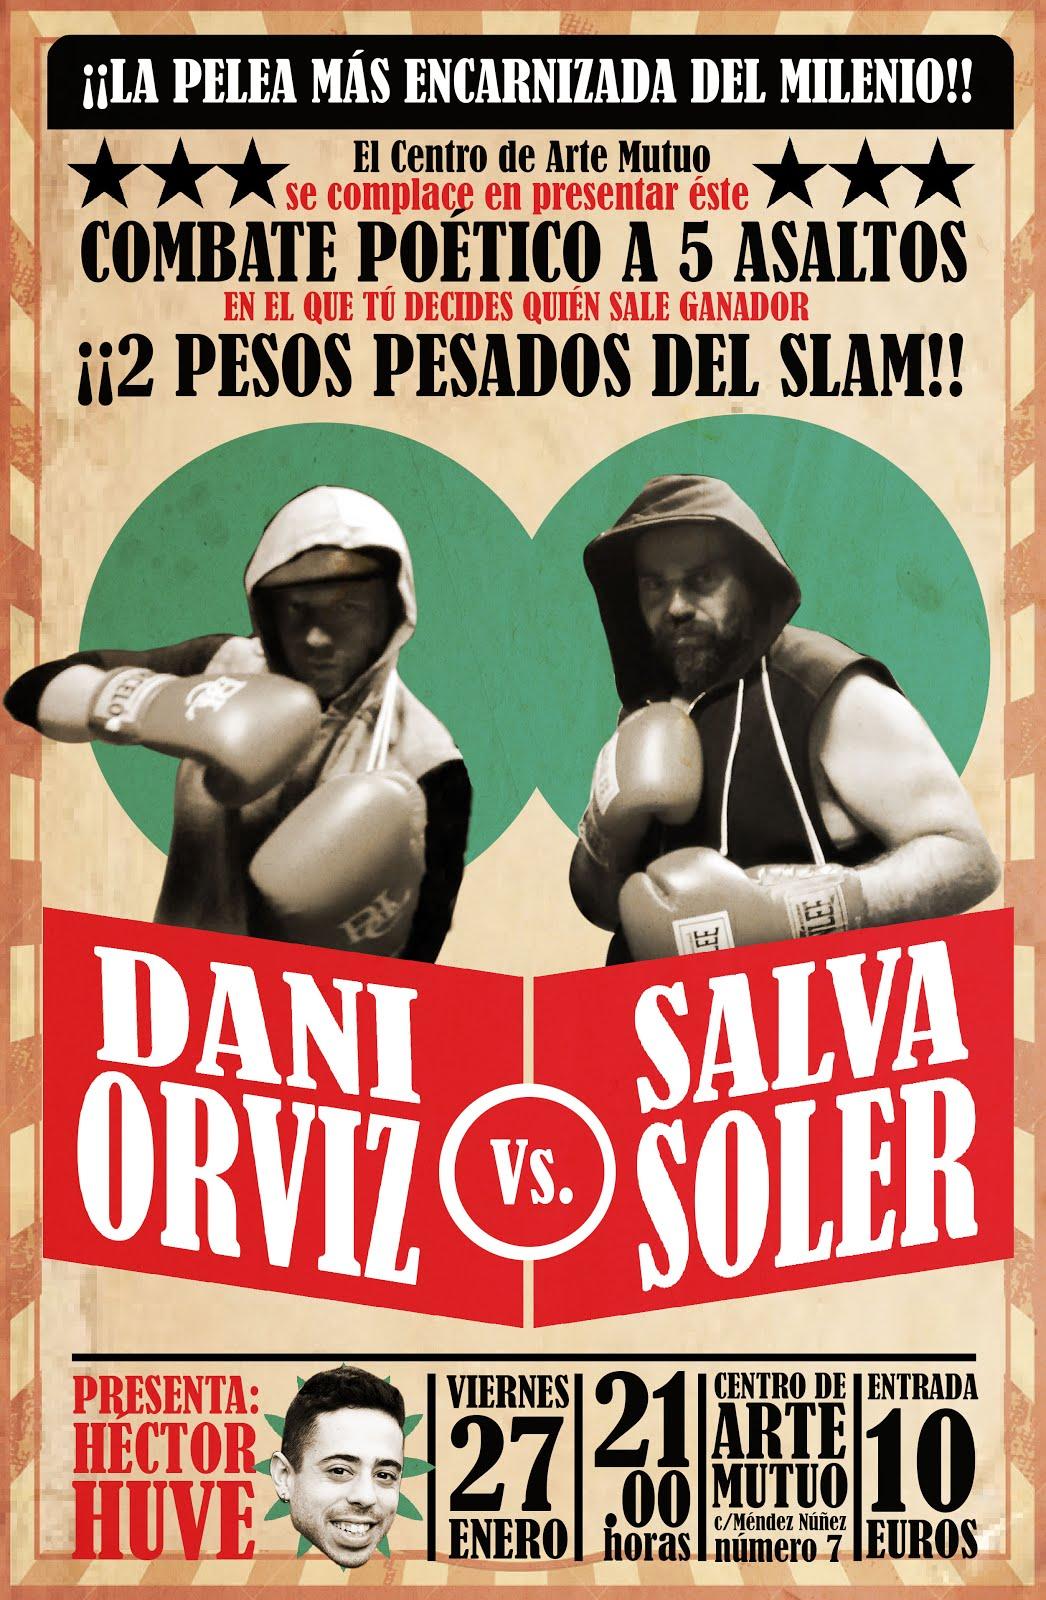 BARCELONA, 27 DE ENERO: DANI ORVIZ VS. SALVA SOLER